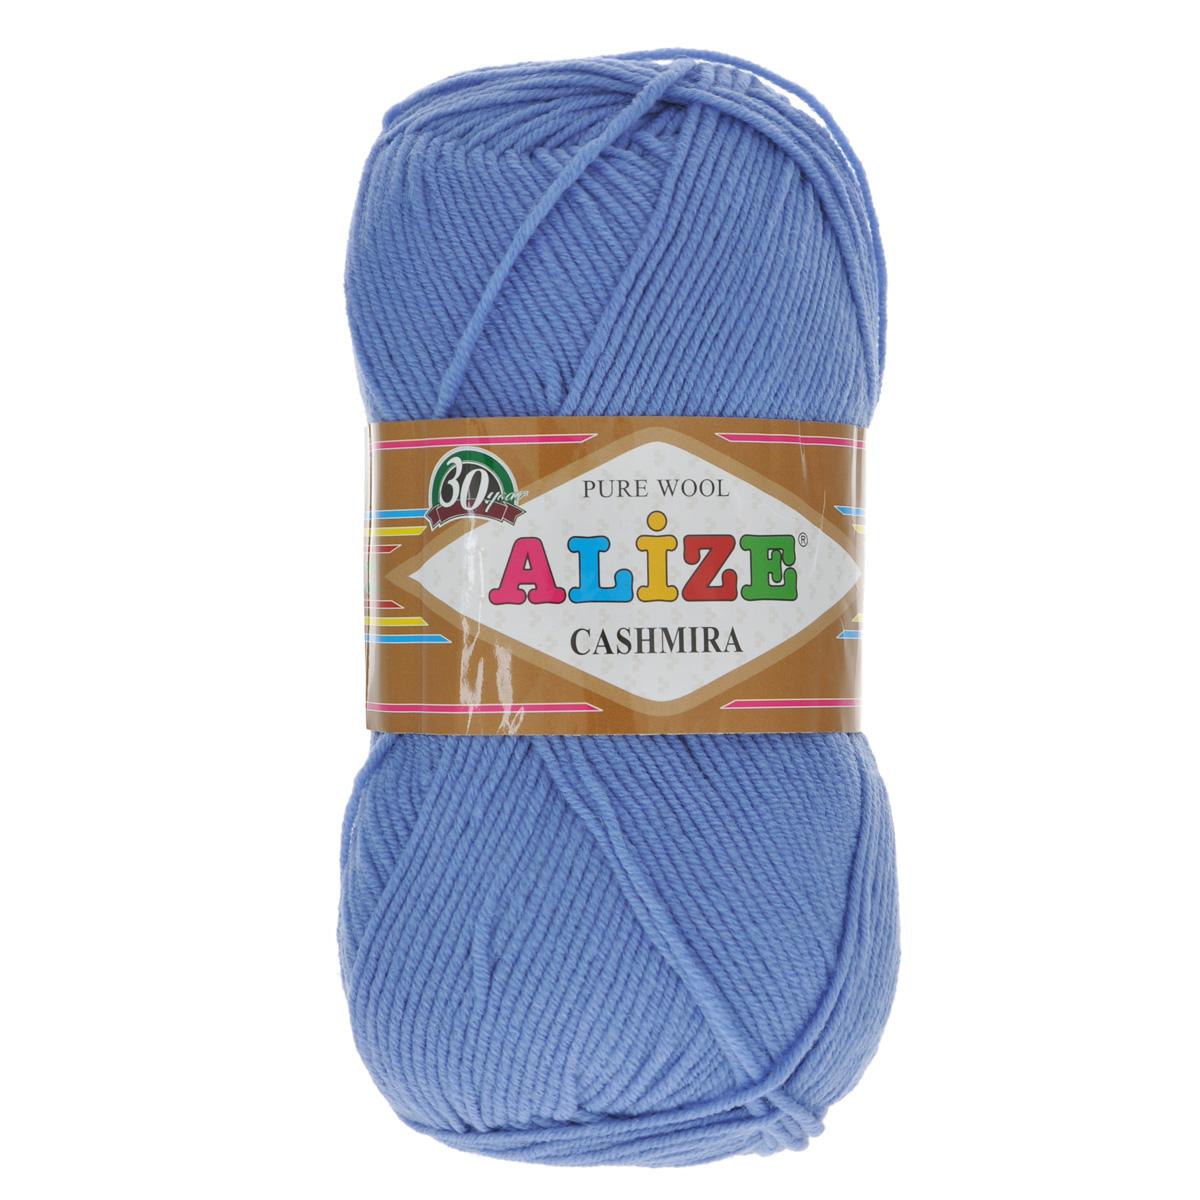 Пряжа для вязания Alize Cashmira, цвет: темно-синий (303), 300 м, 100 г, 5 шт цена